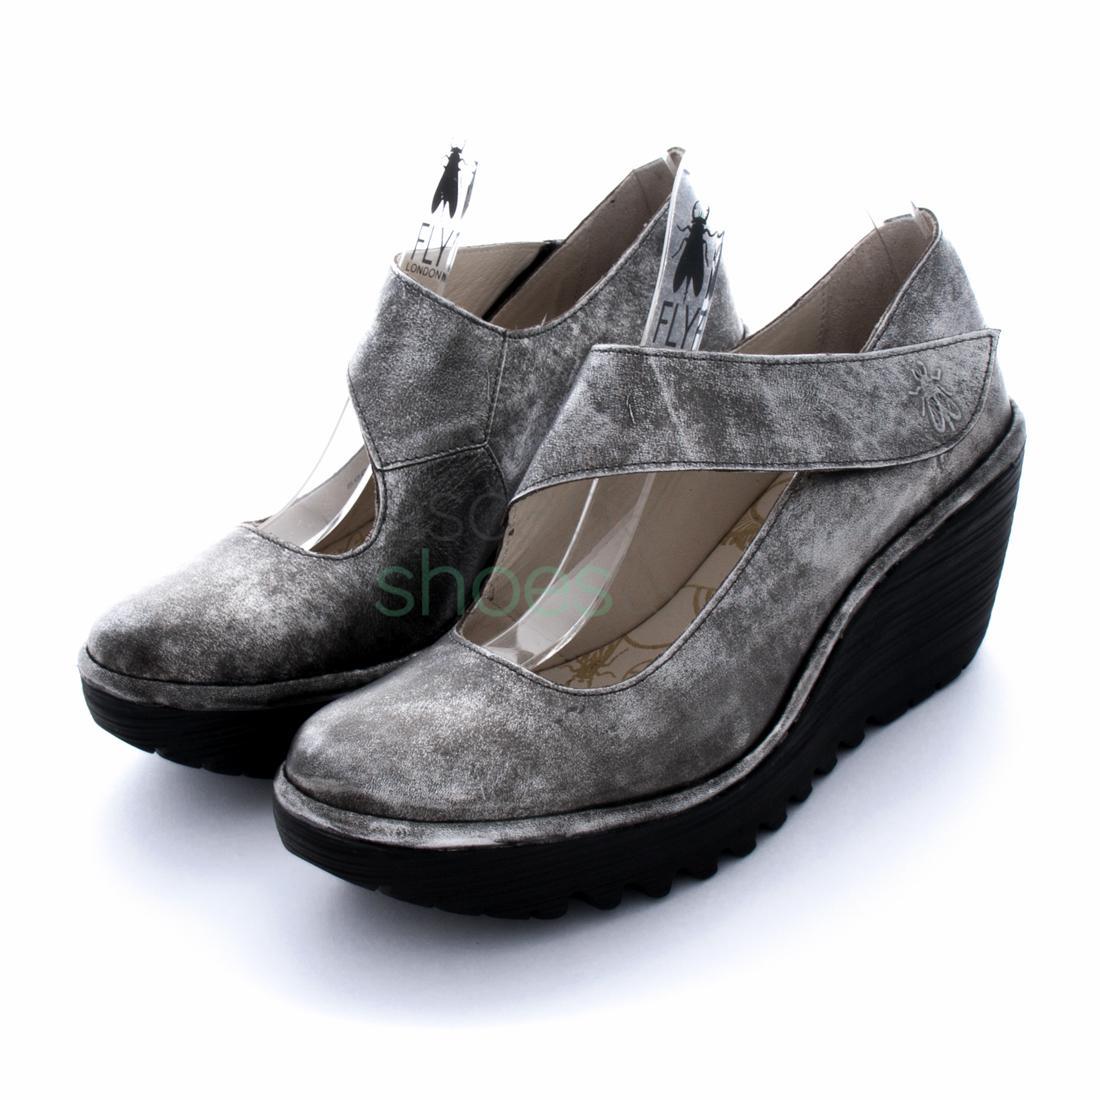 f1cde483be7 Compra aquí tus Zapatos FLY LONDON Yellow Yasi682 Silver P500682012 ...